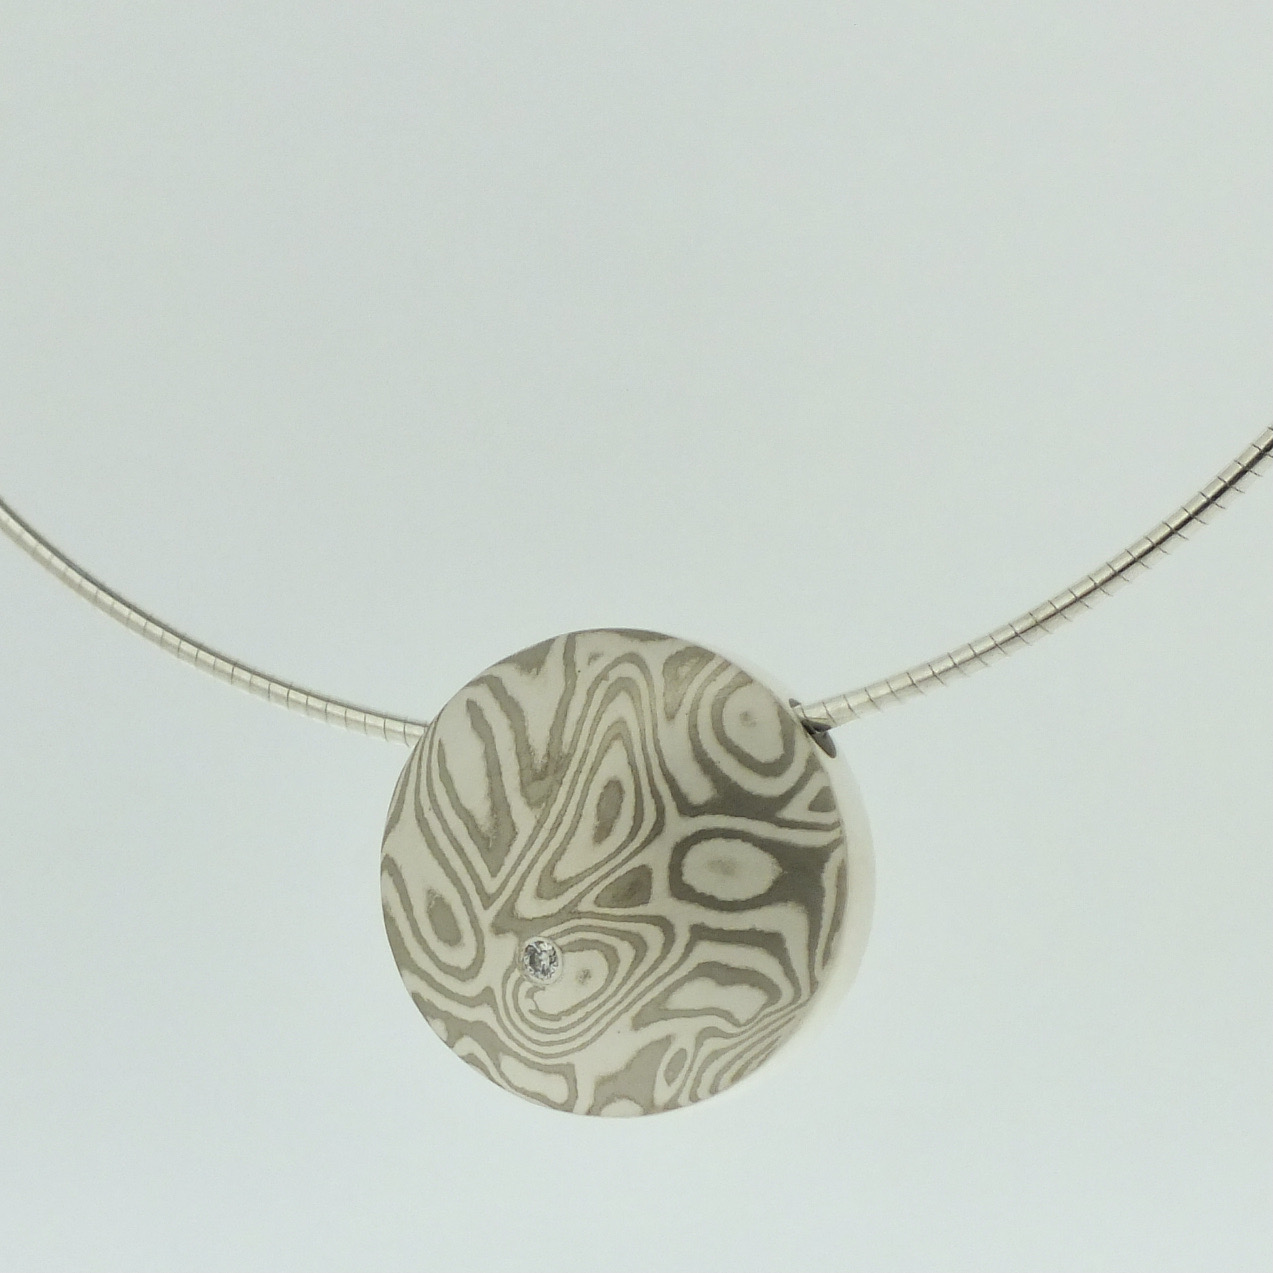 18k white gold and silver mokume gane medium Discus pendant with diamond